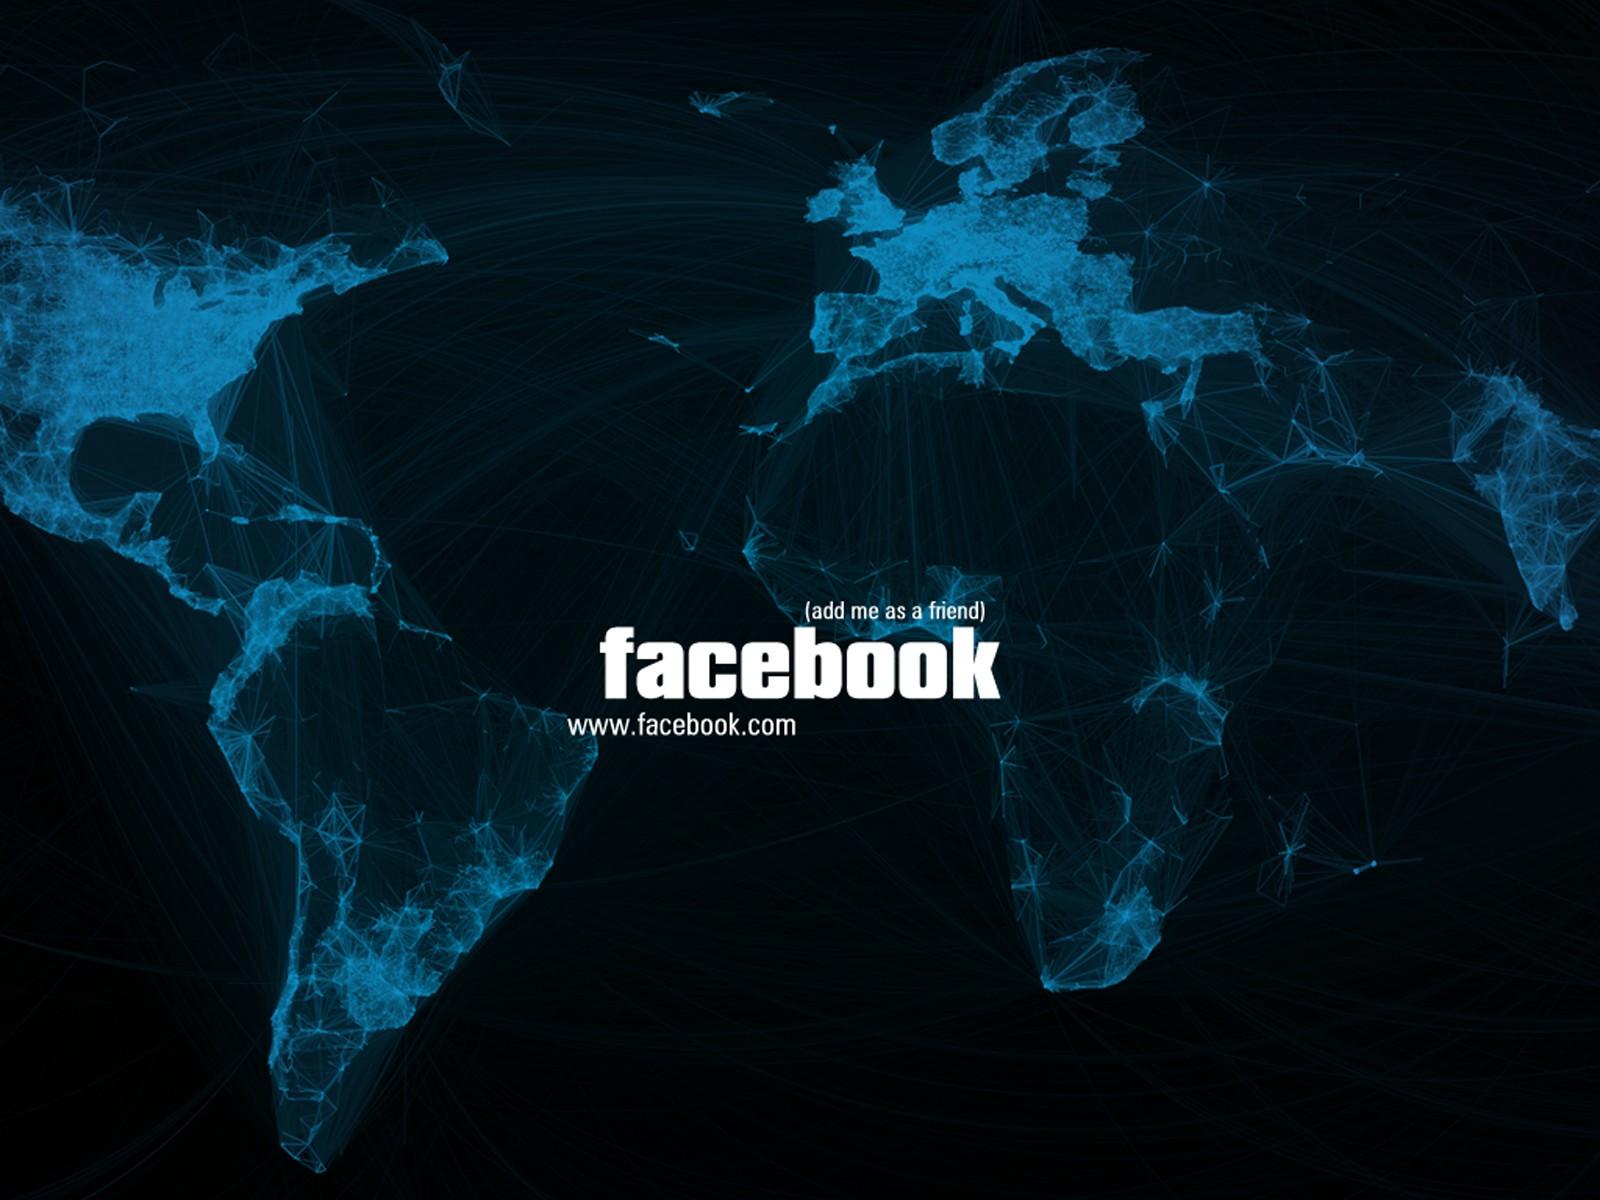 Free Download Facebook Wallpapers Facebook Myspace